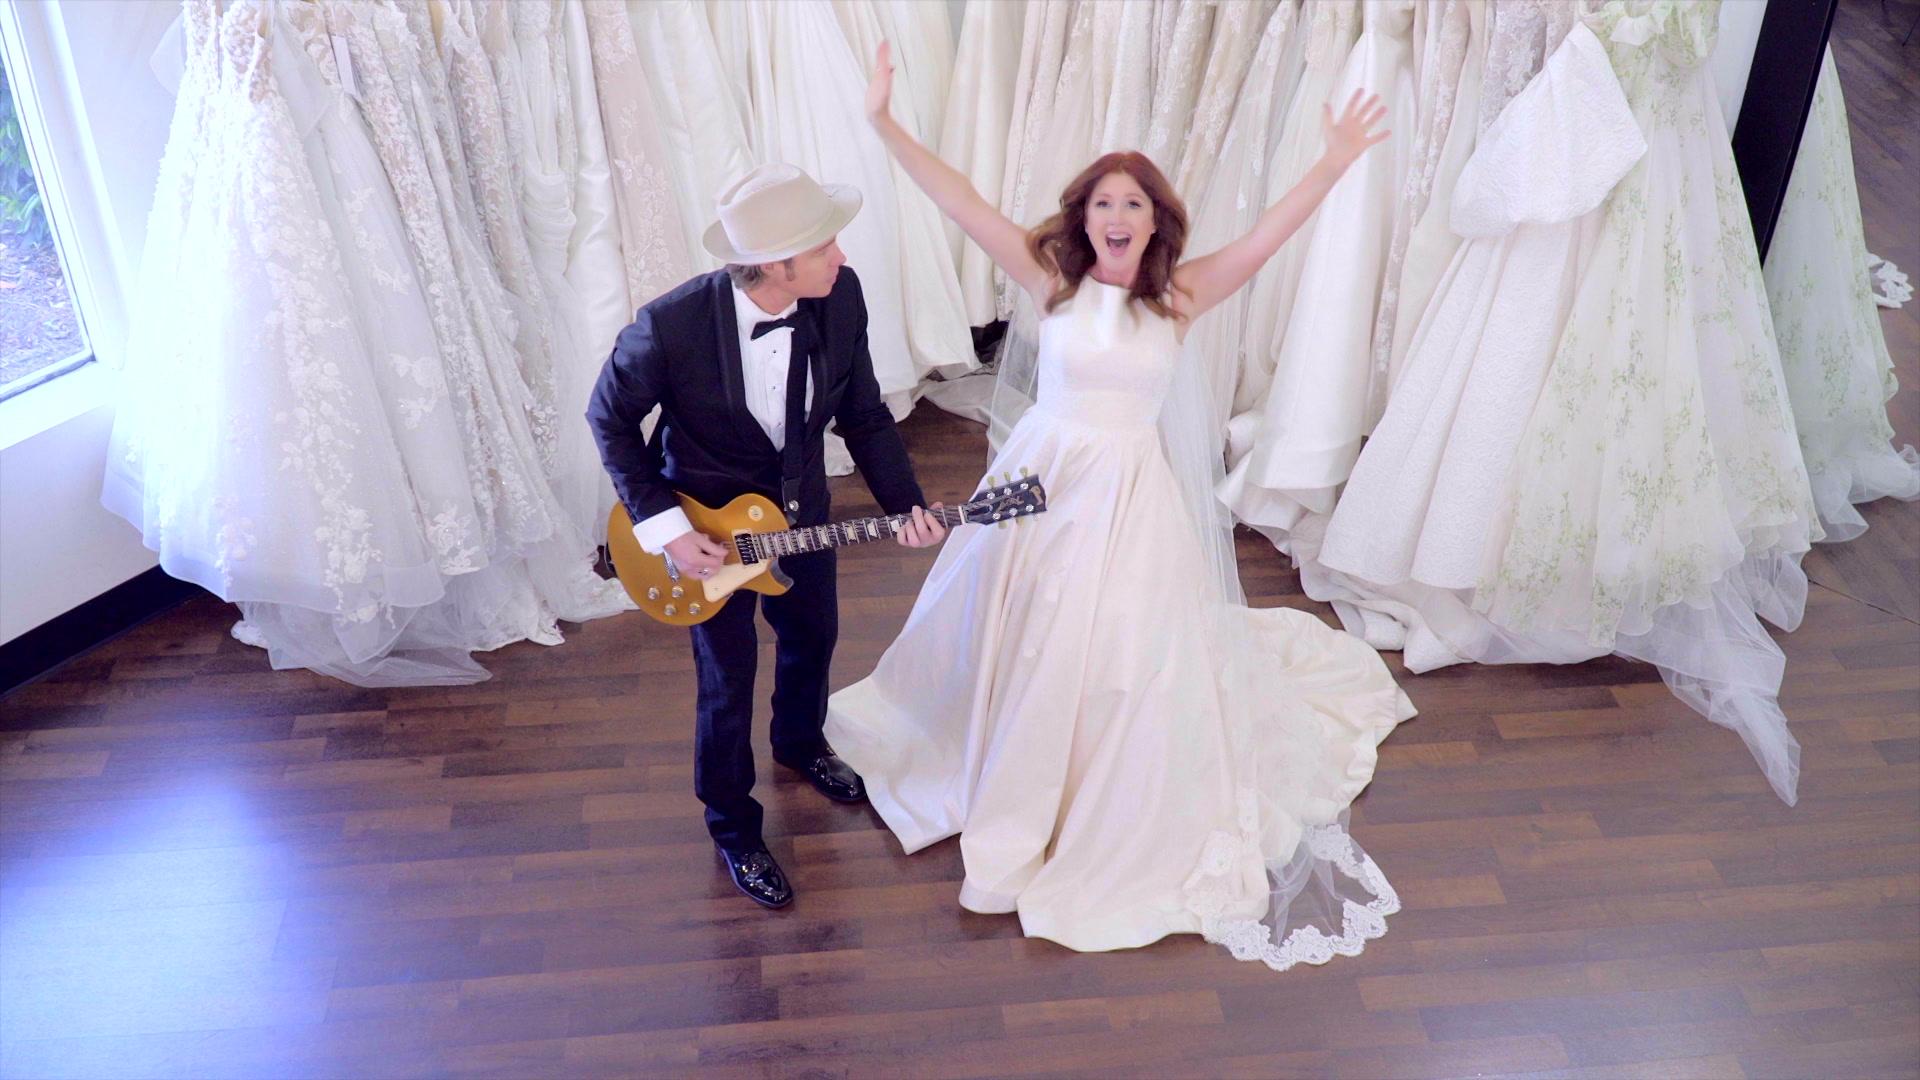 Bridezilla (It Only Gets Better) - O'Shea